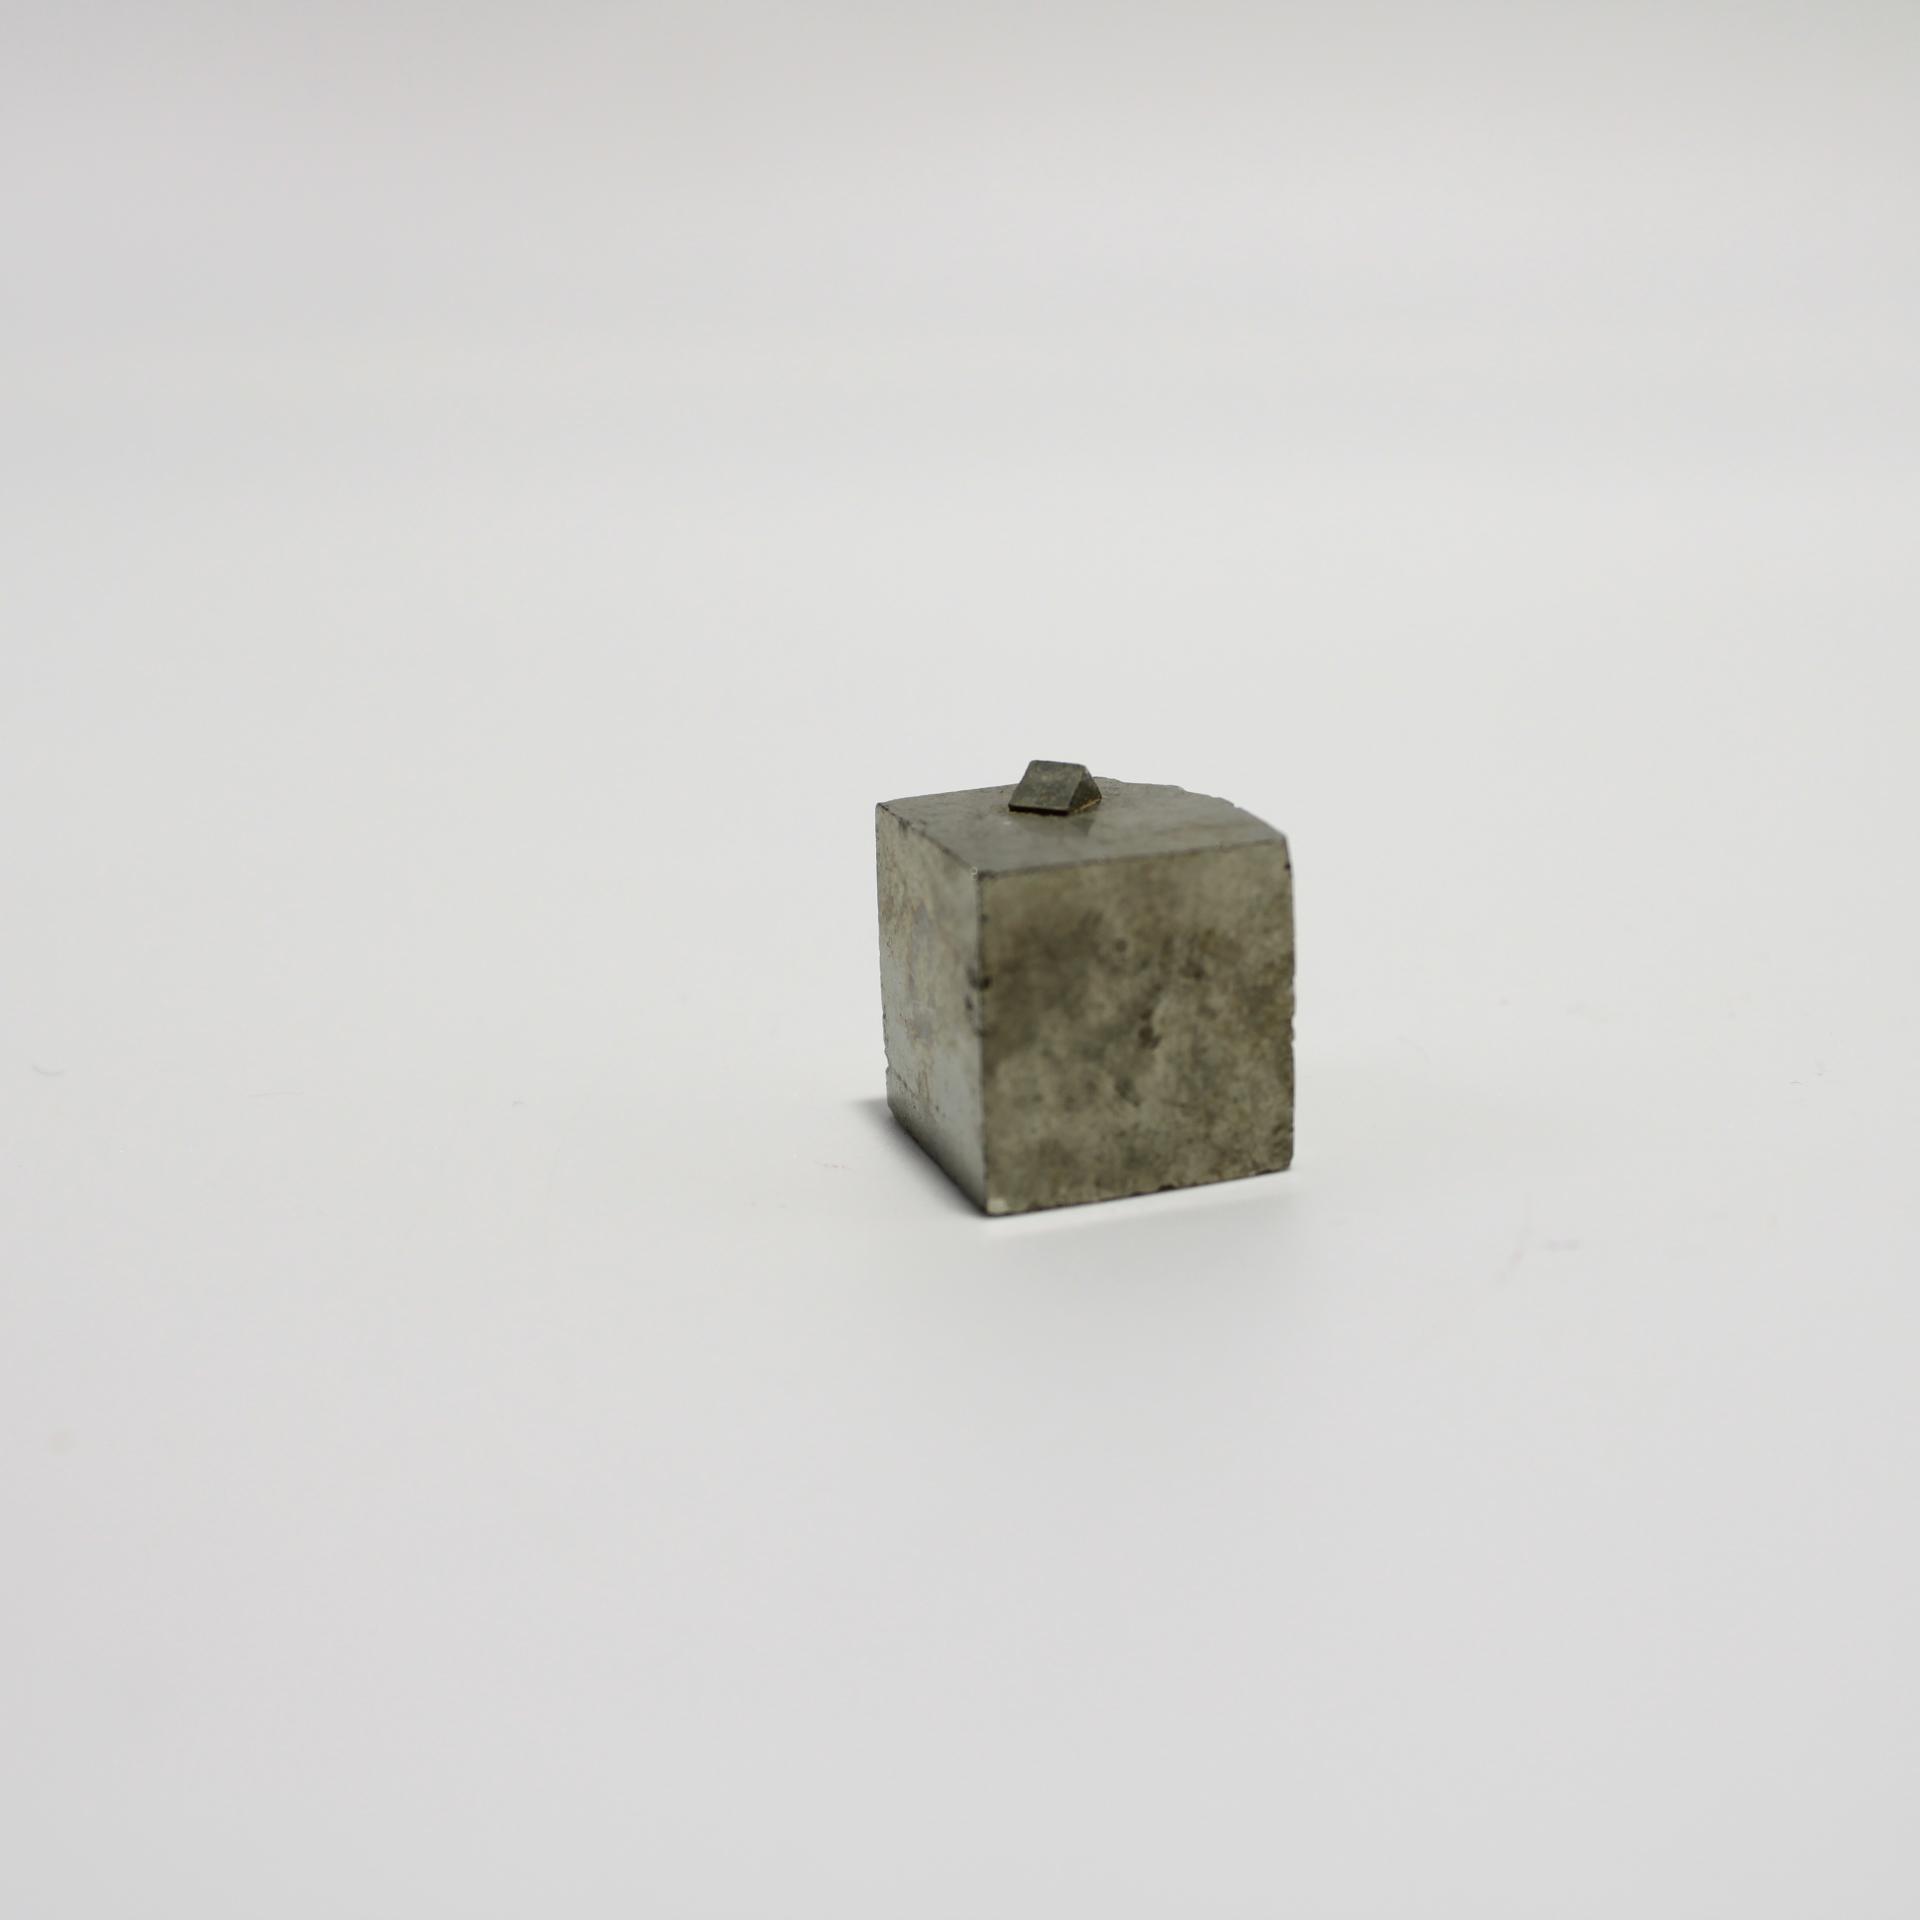 I75 pyritecube 6